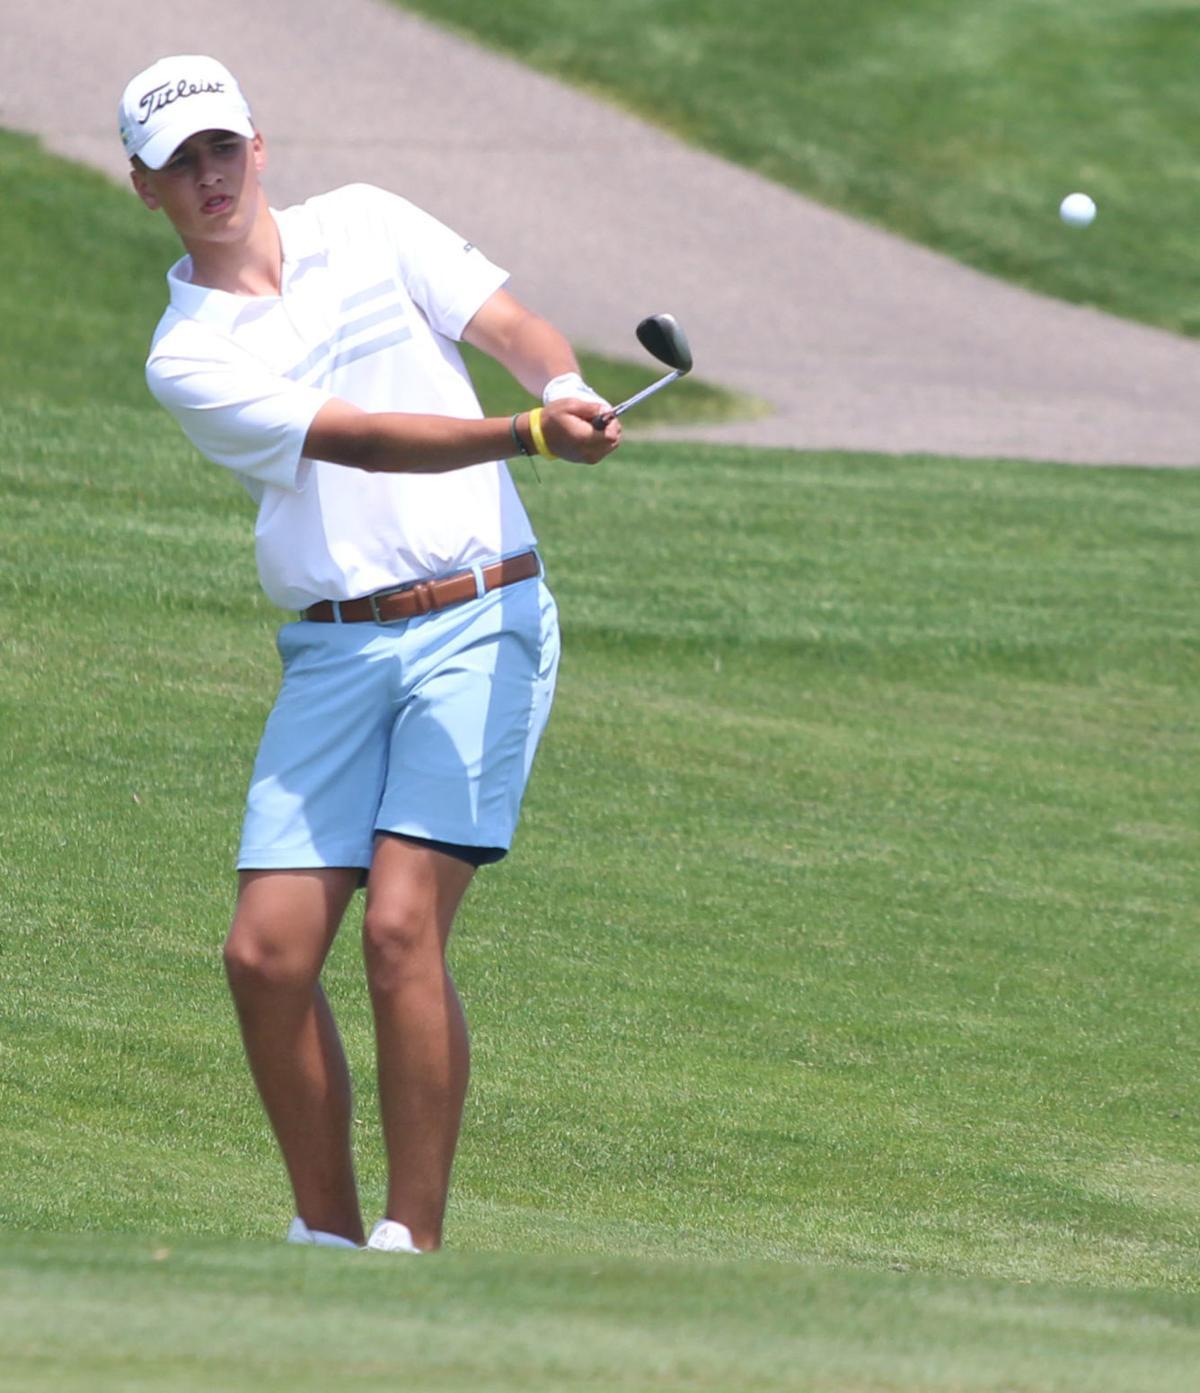 Chan Golf - Renner